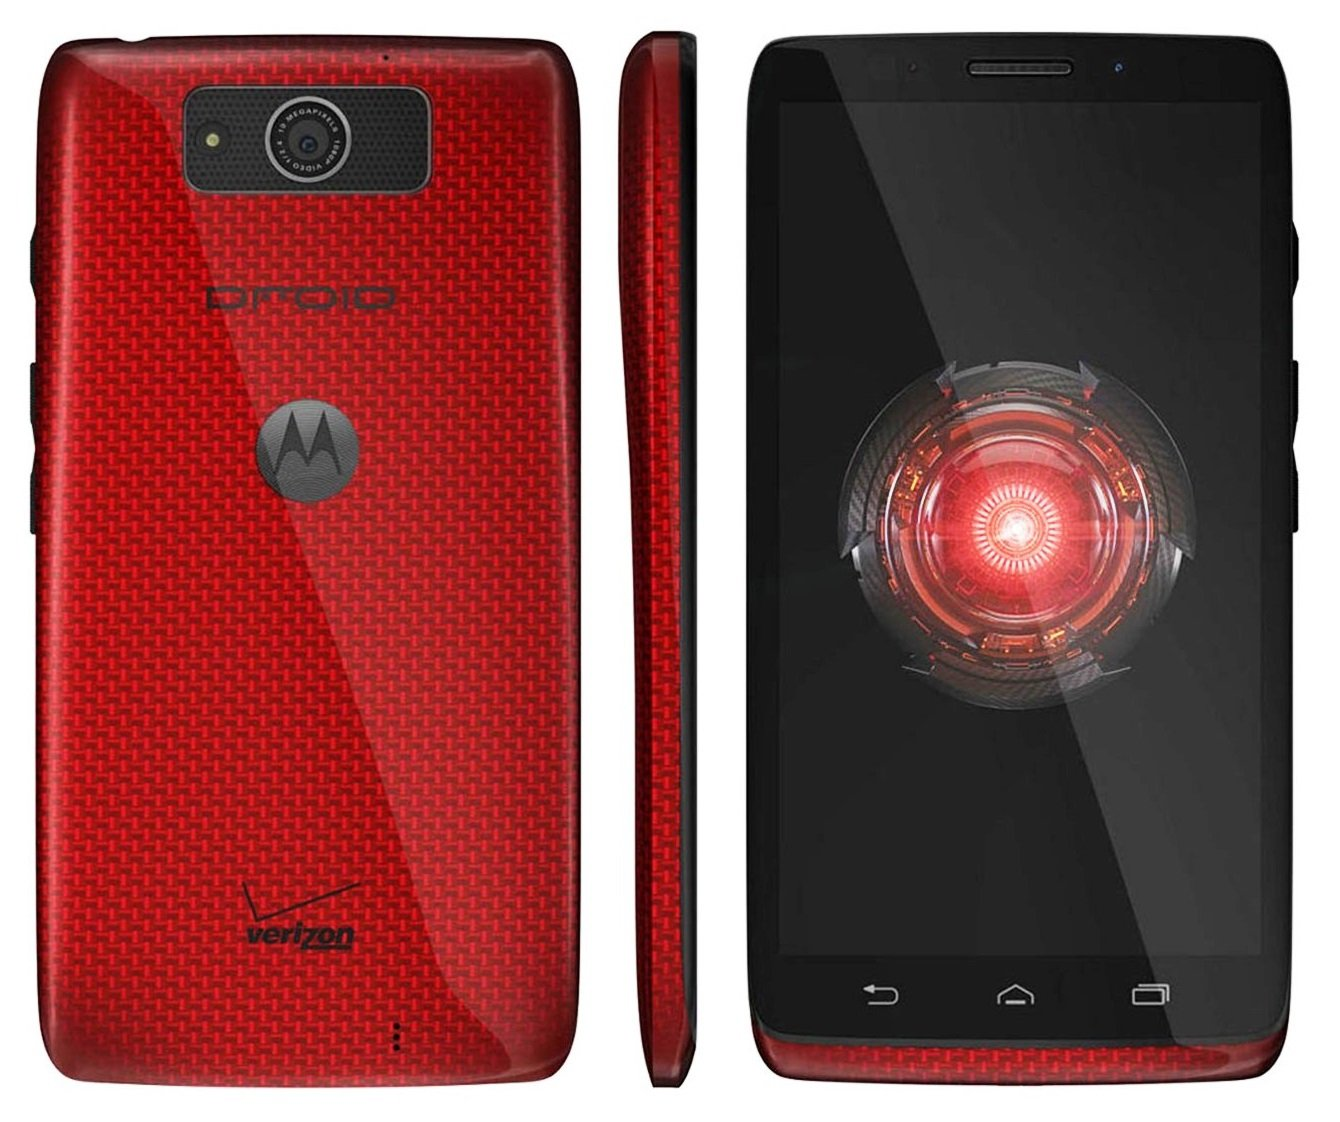 Motorola DROID ULTRA, Red (Verizon Wireless)